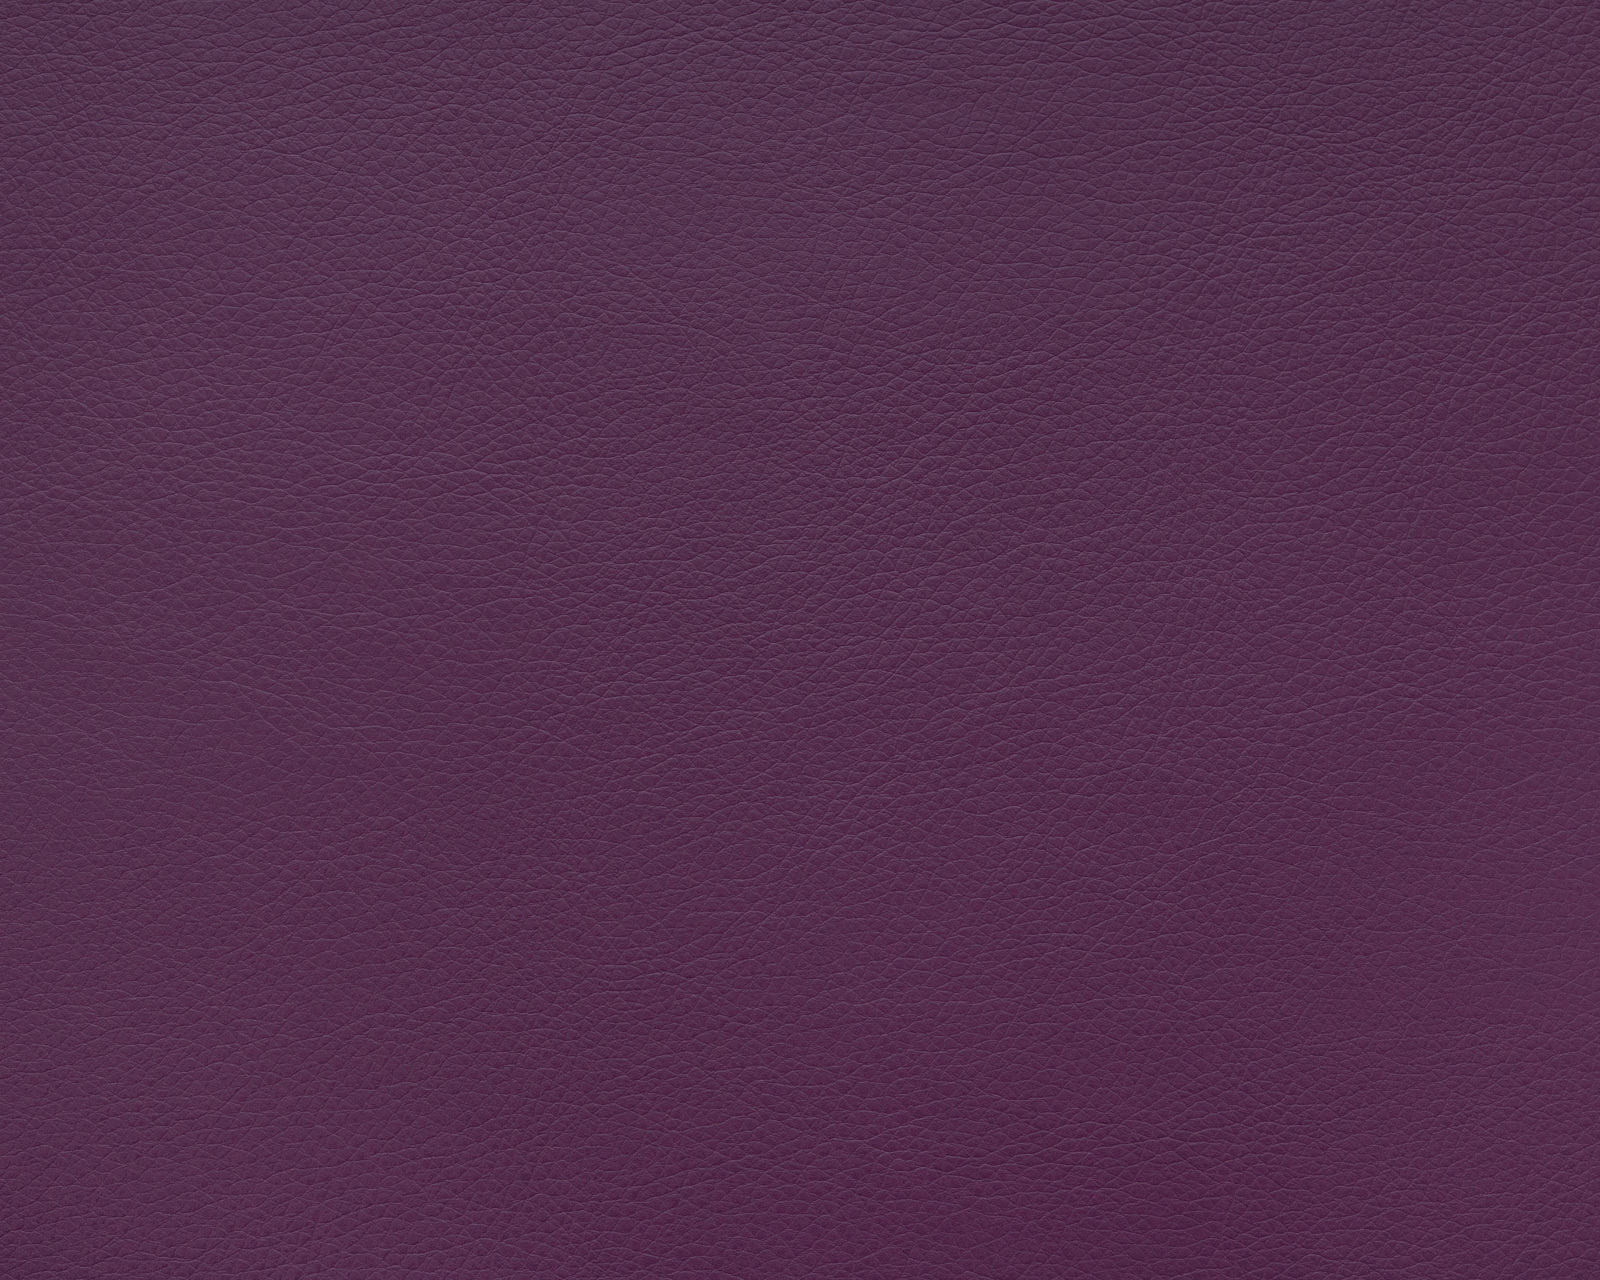 Marvel Purple иск.кожа